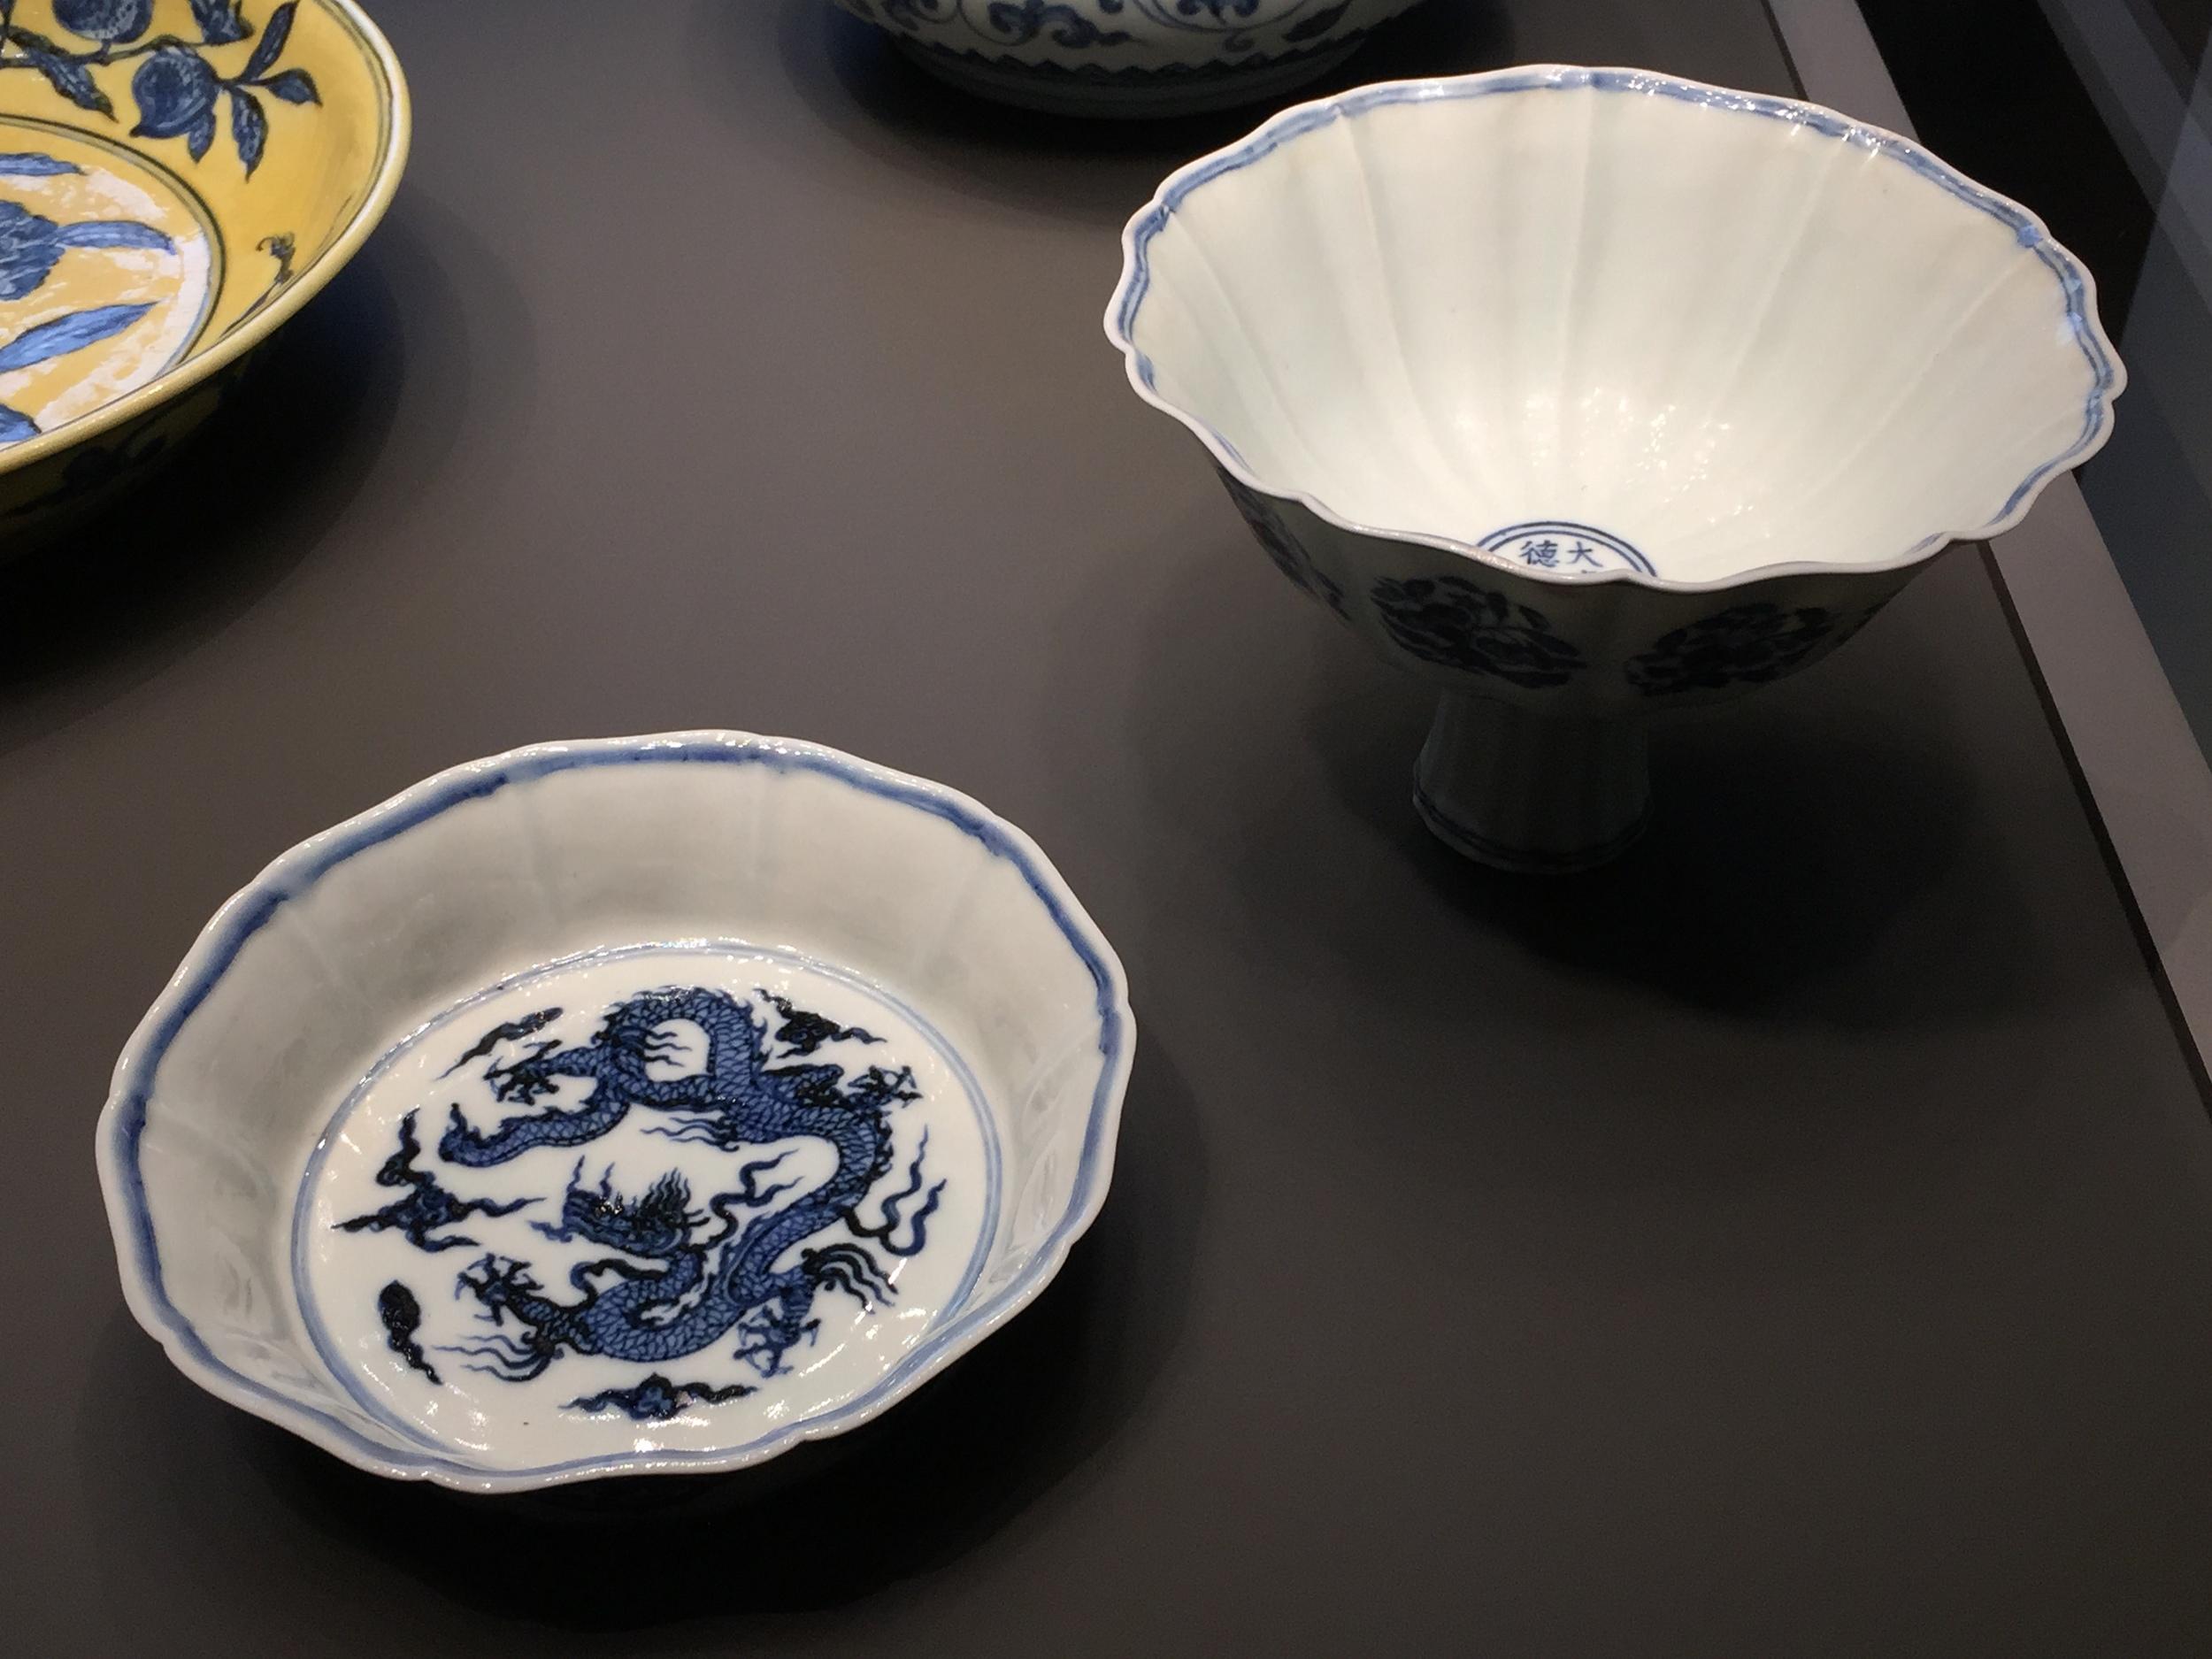 Chinese-Porcelain-British-Museum-Percival-David-jessewaugh.com-56.jpg